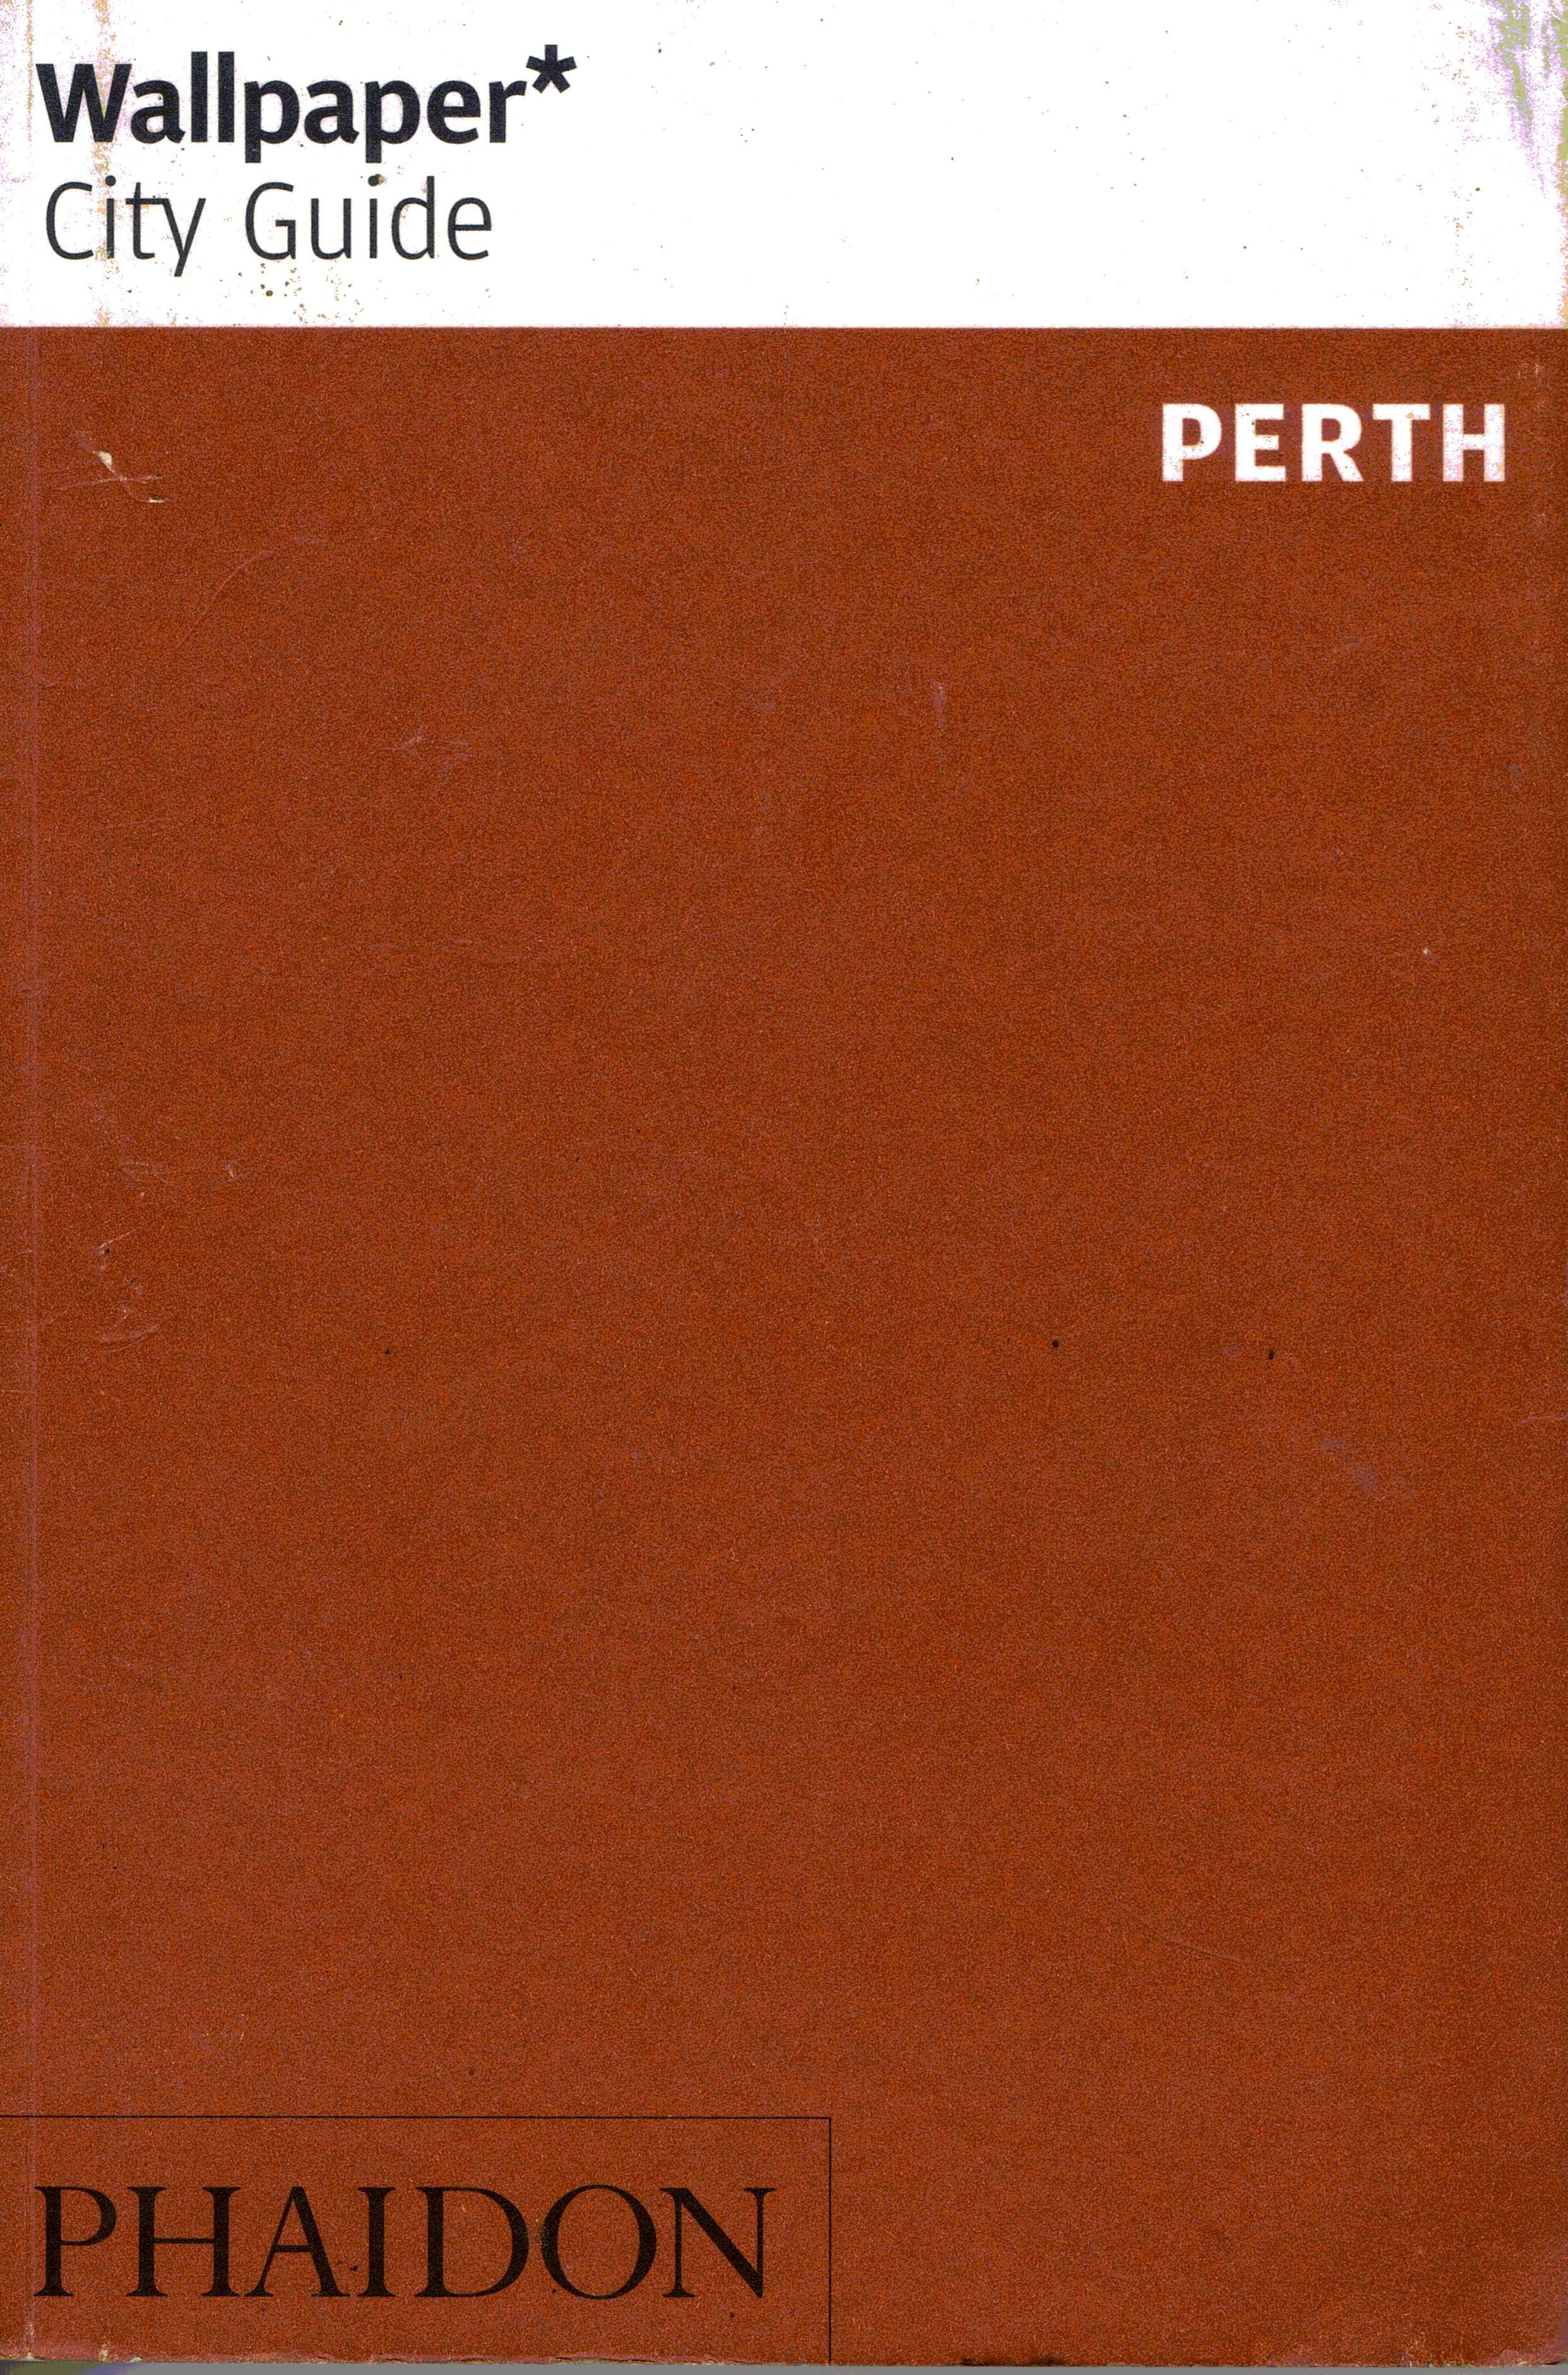 Wallpaper+City+Guide+Perth.jpg